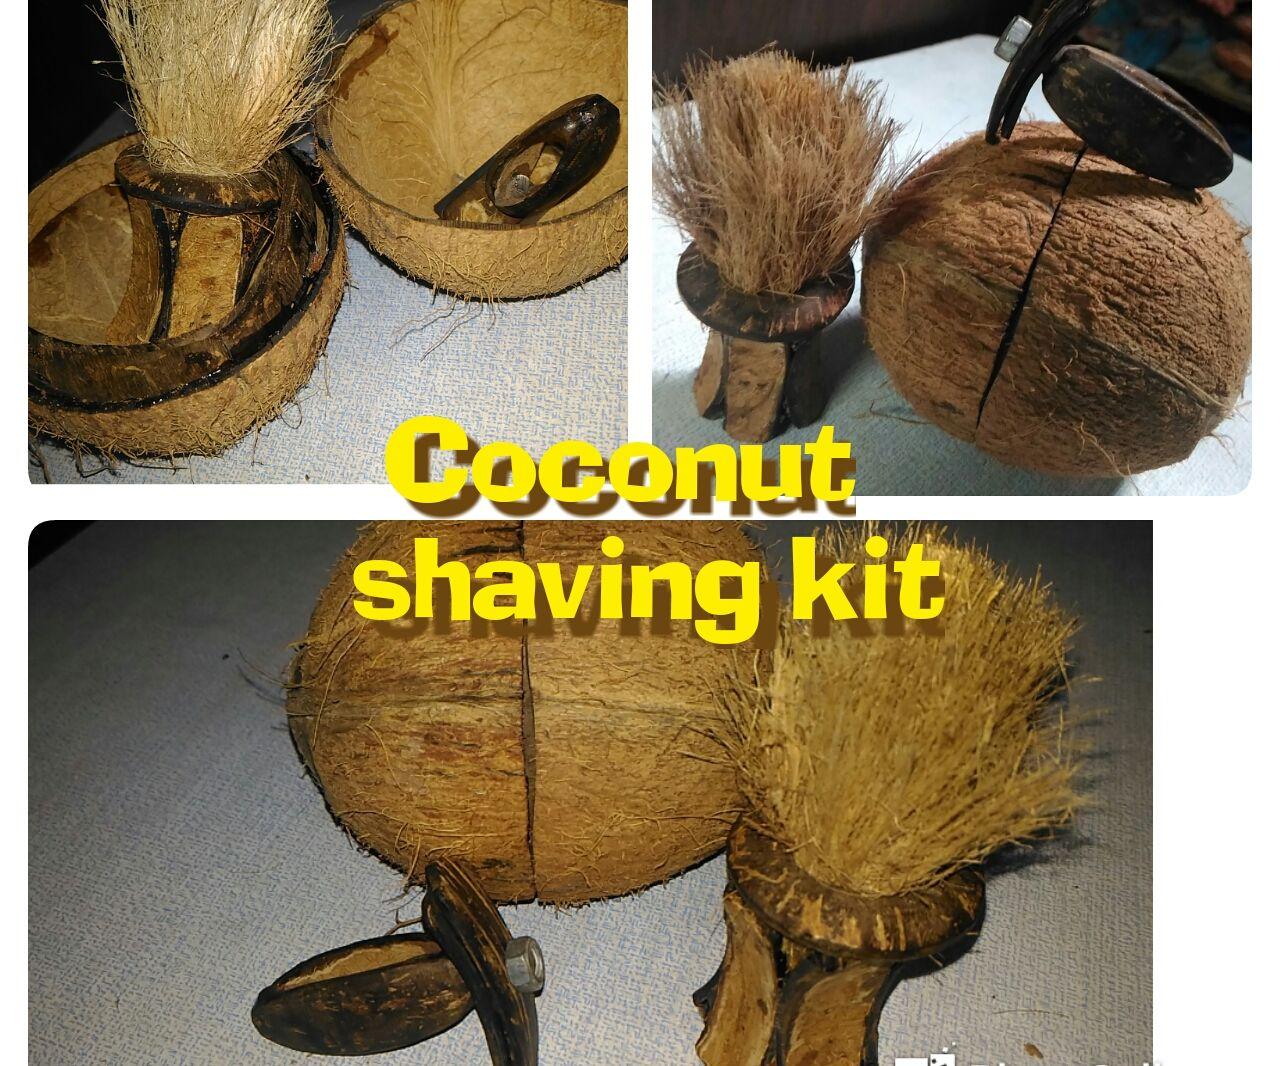 Shaving Kit from Coconut Shell